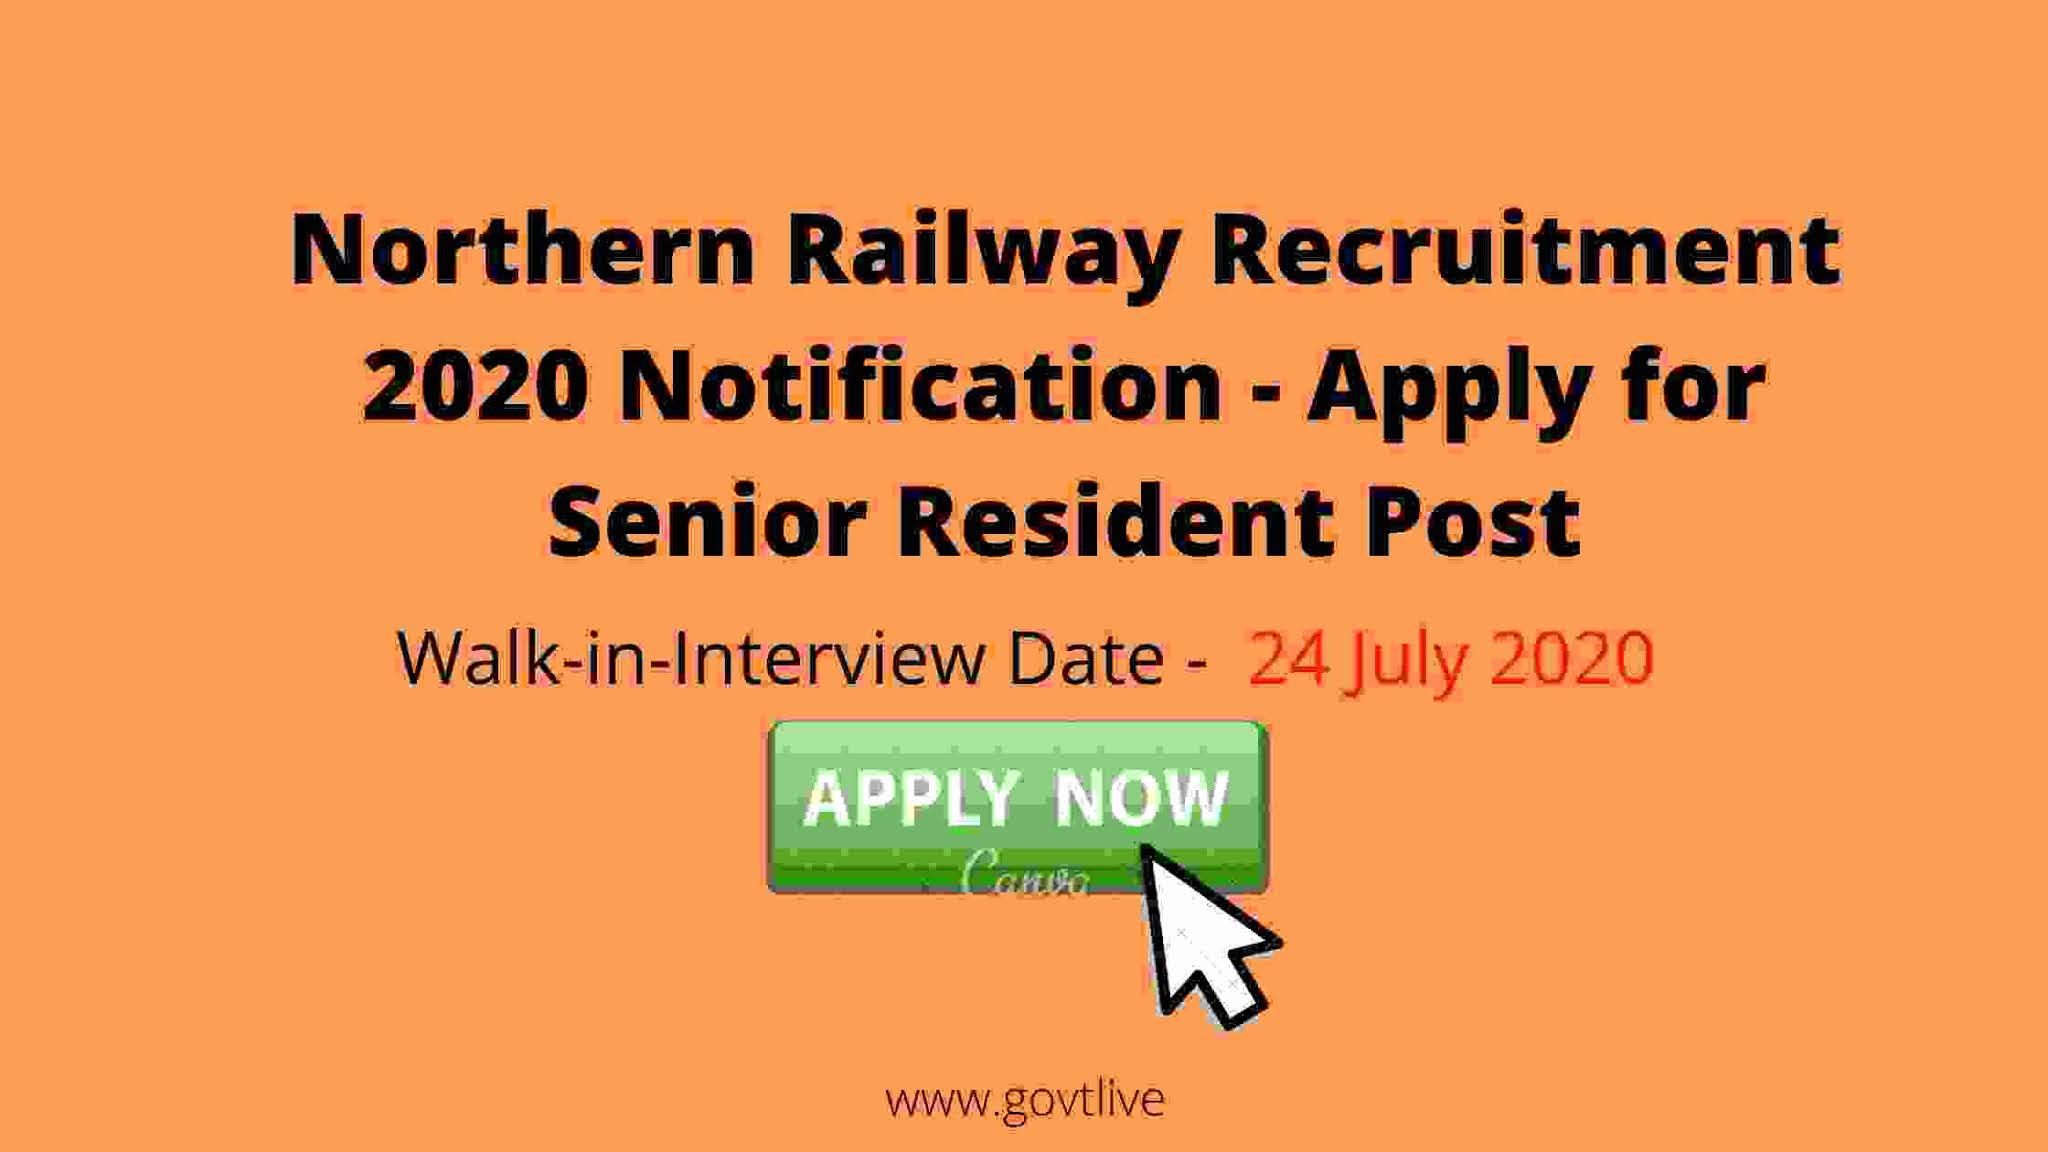 Northern Railway Recruitment 2020 Notification - Apply for Senior Resident Post